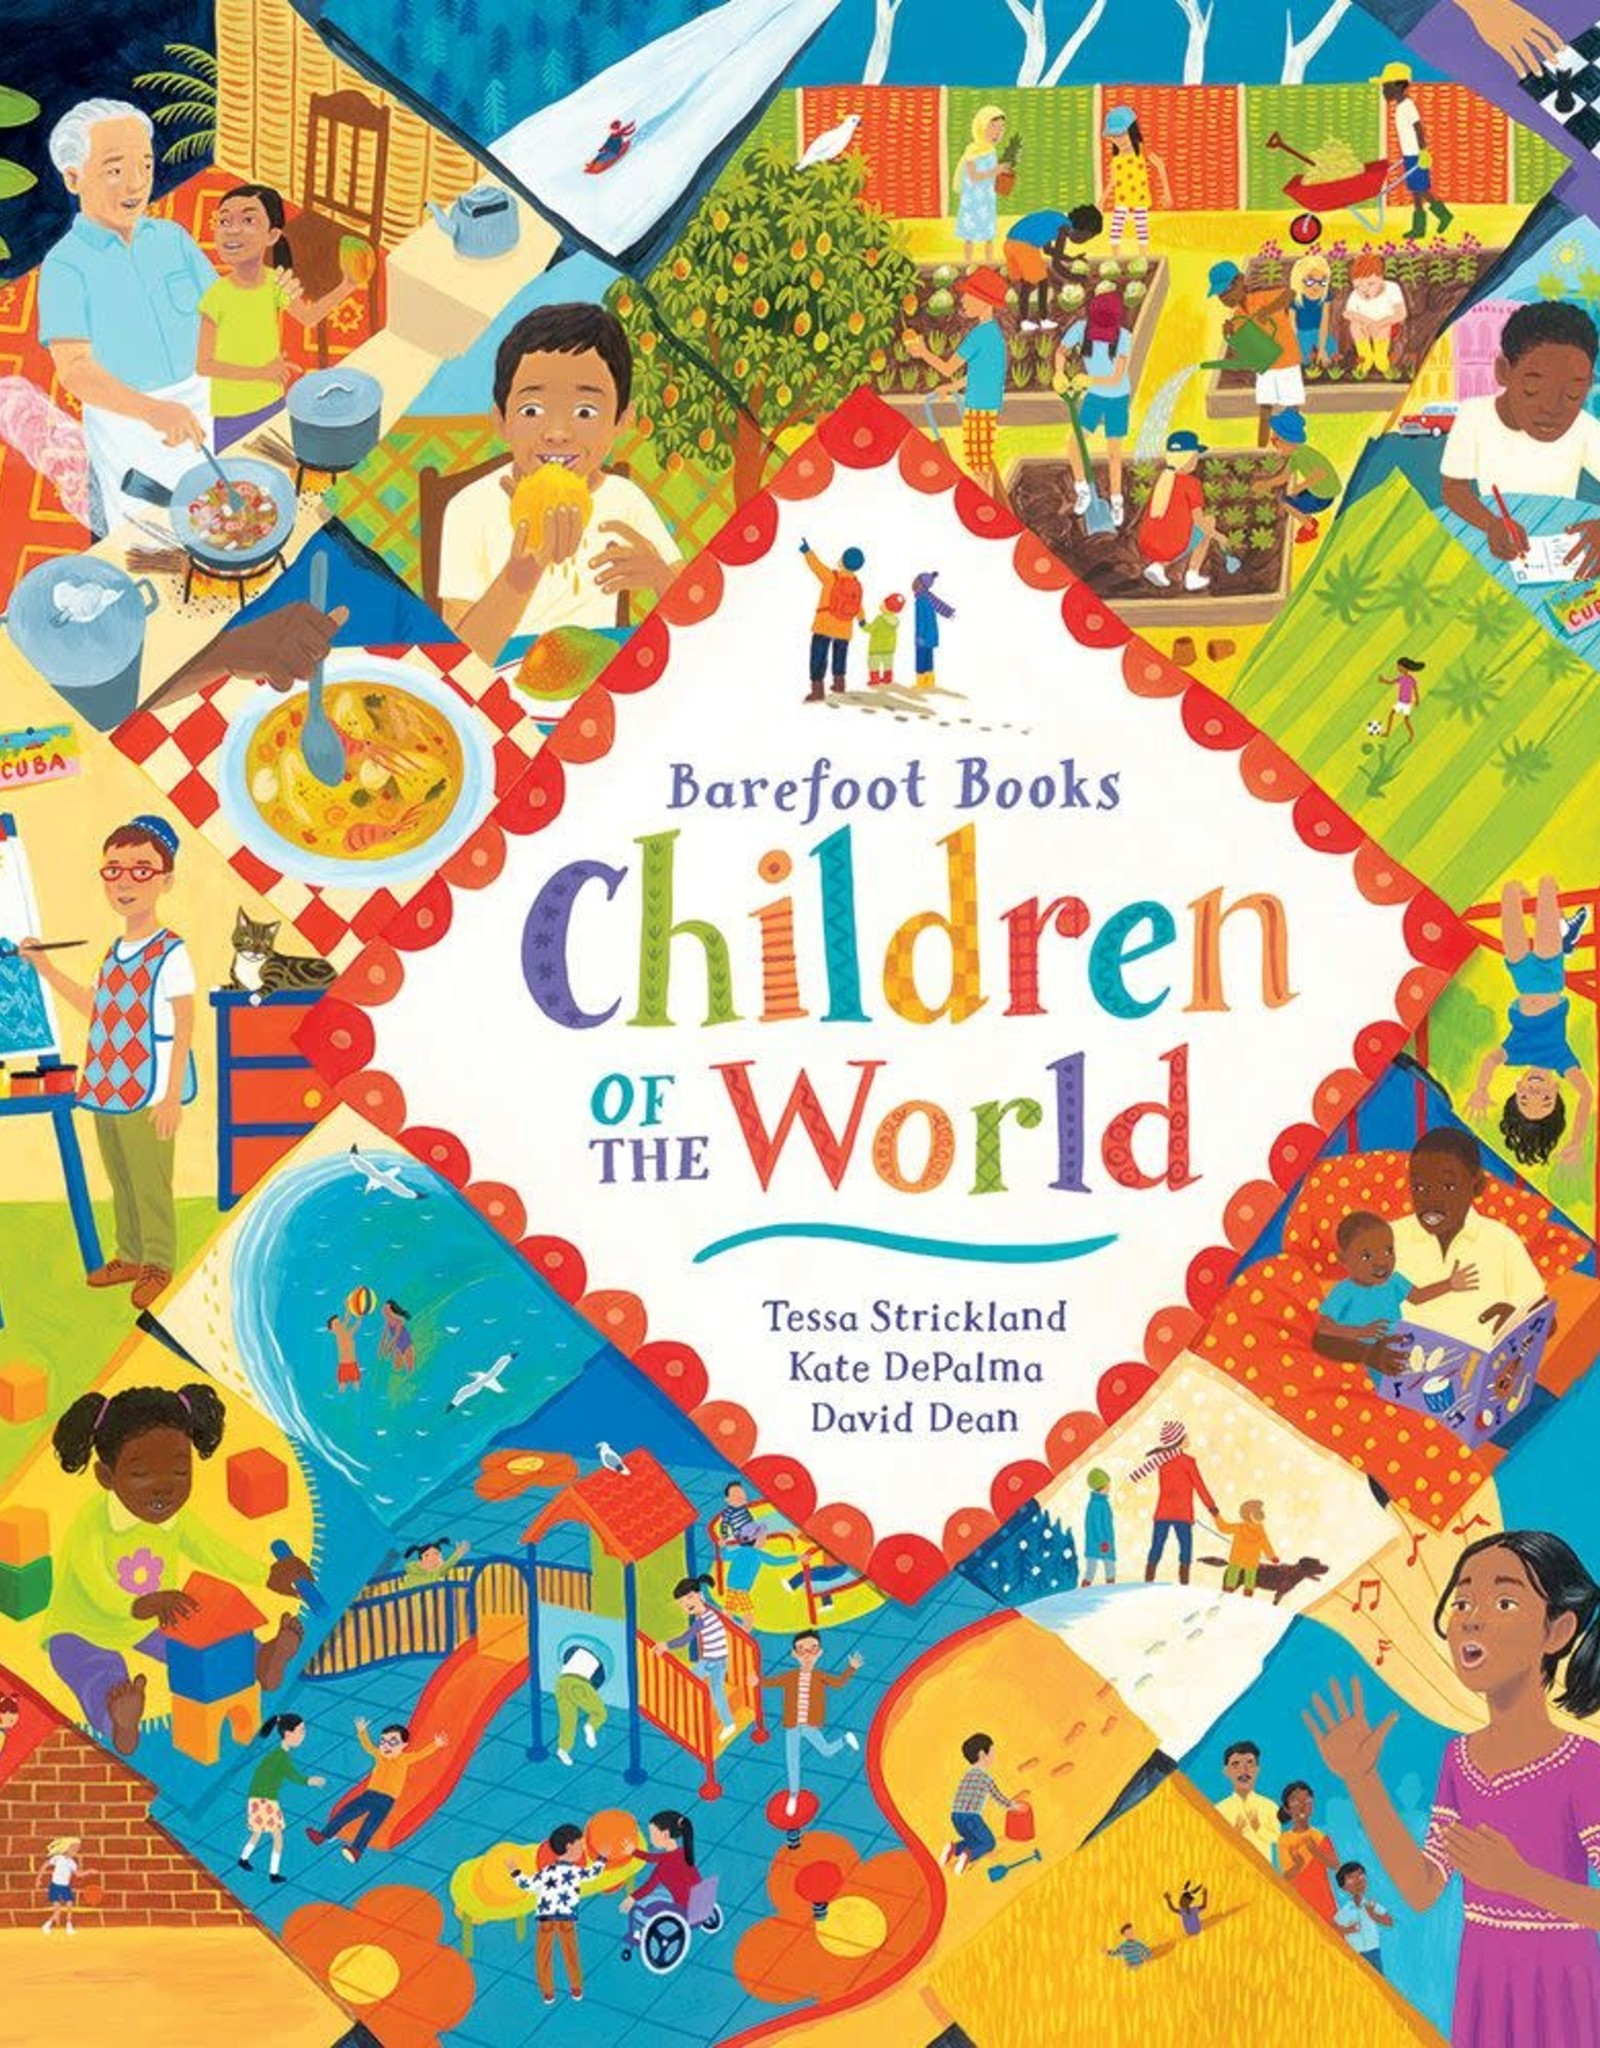 Barefoot Books Barefoot Books Children of the World